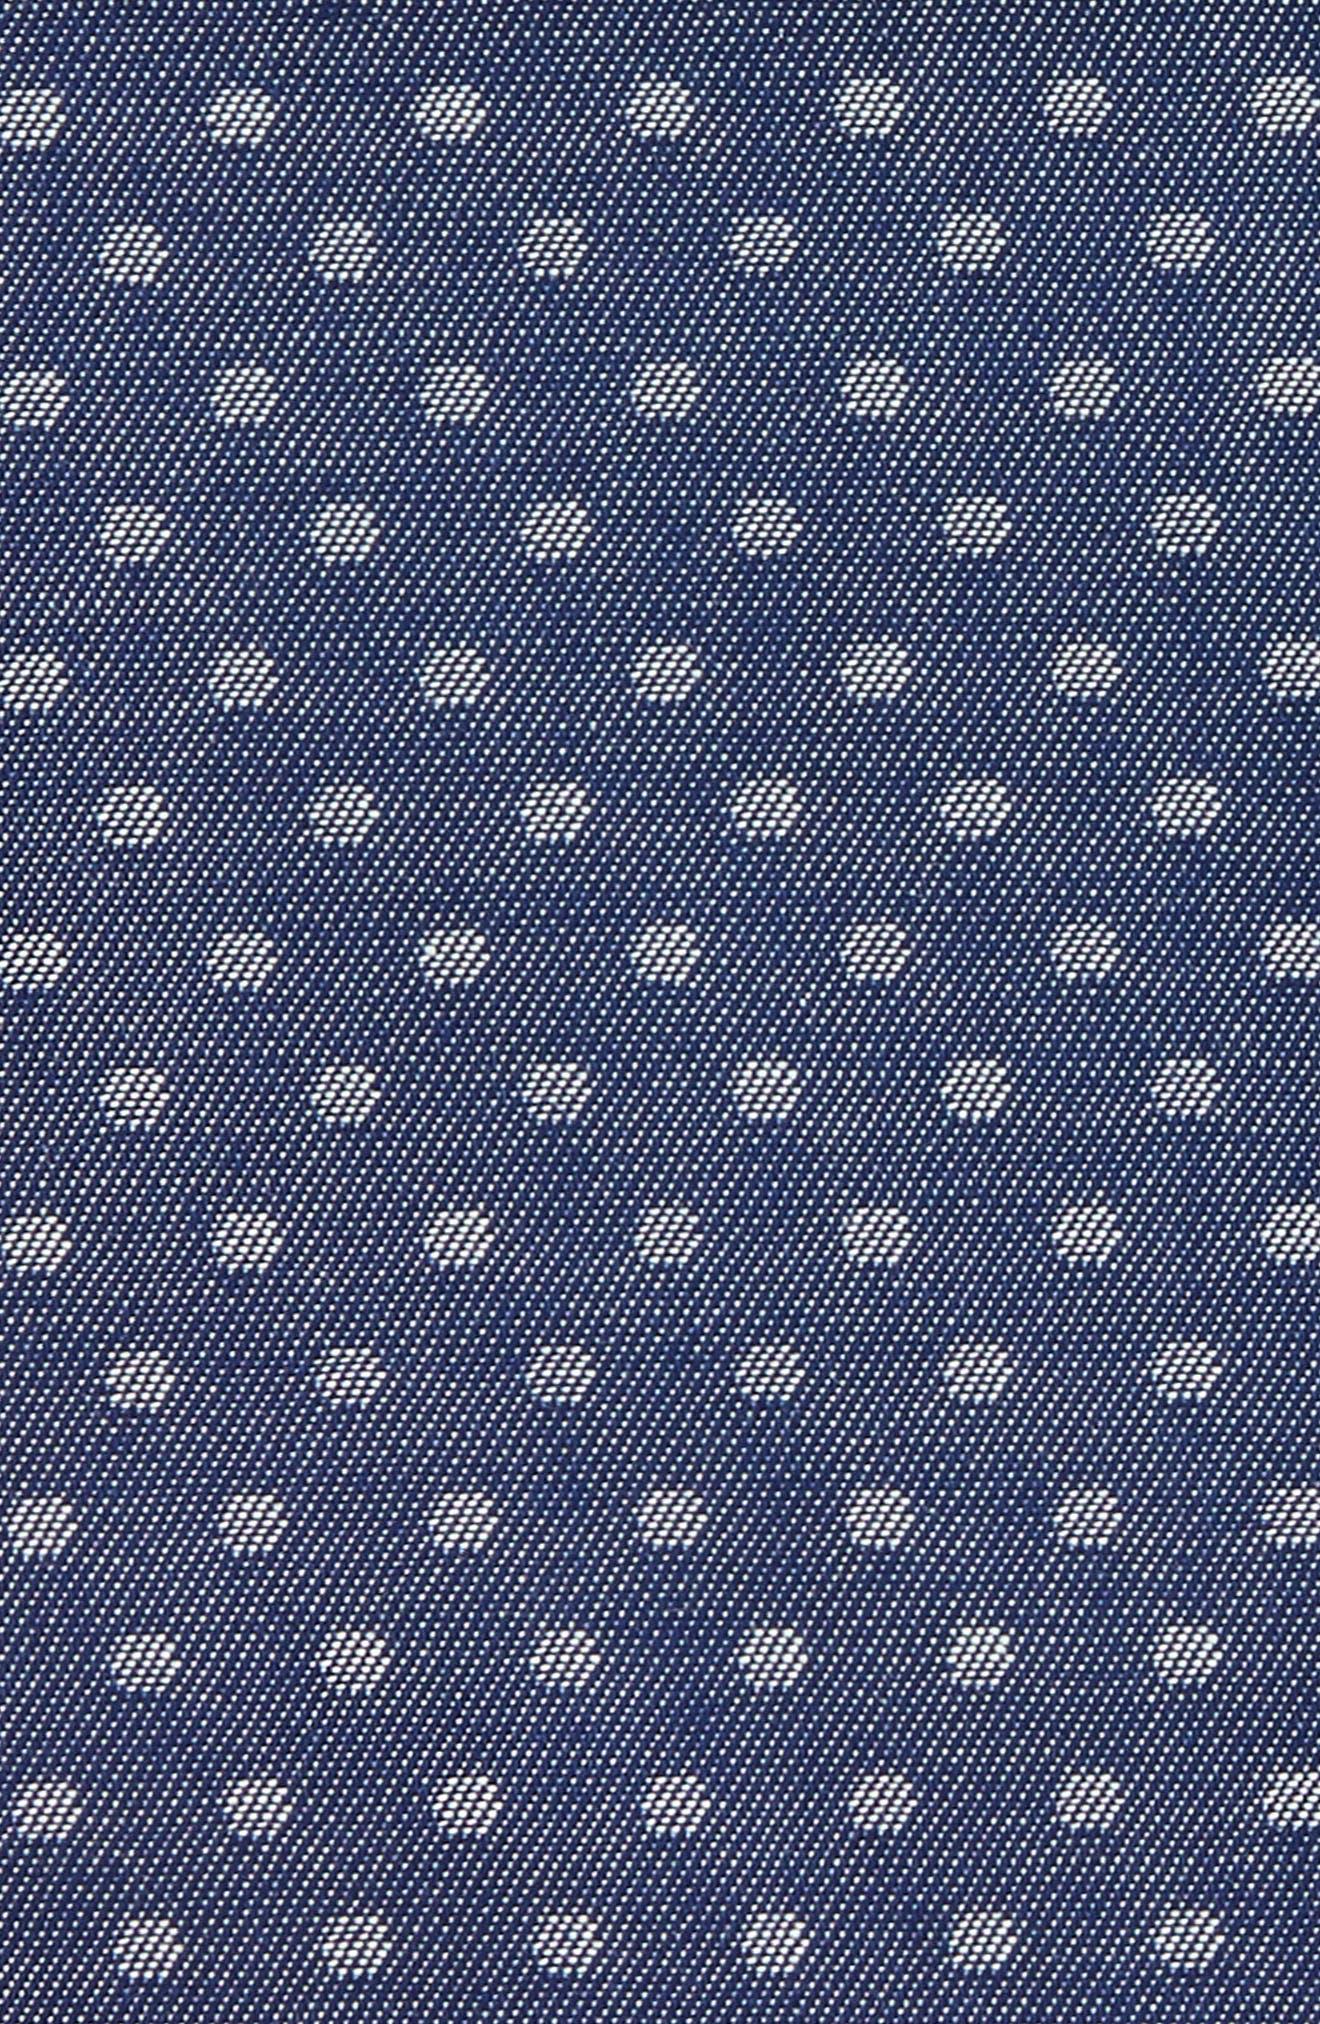 Polka Dot Silk Pocket Square,                             Alternate thumbnail 3, color,                             400